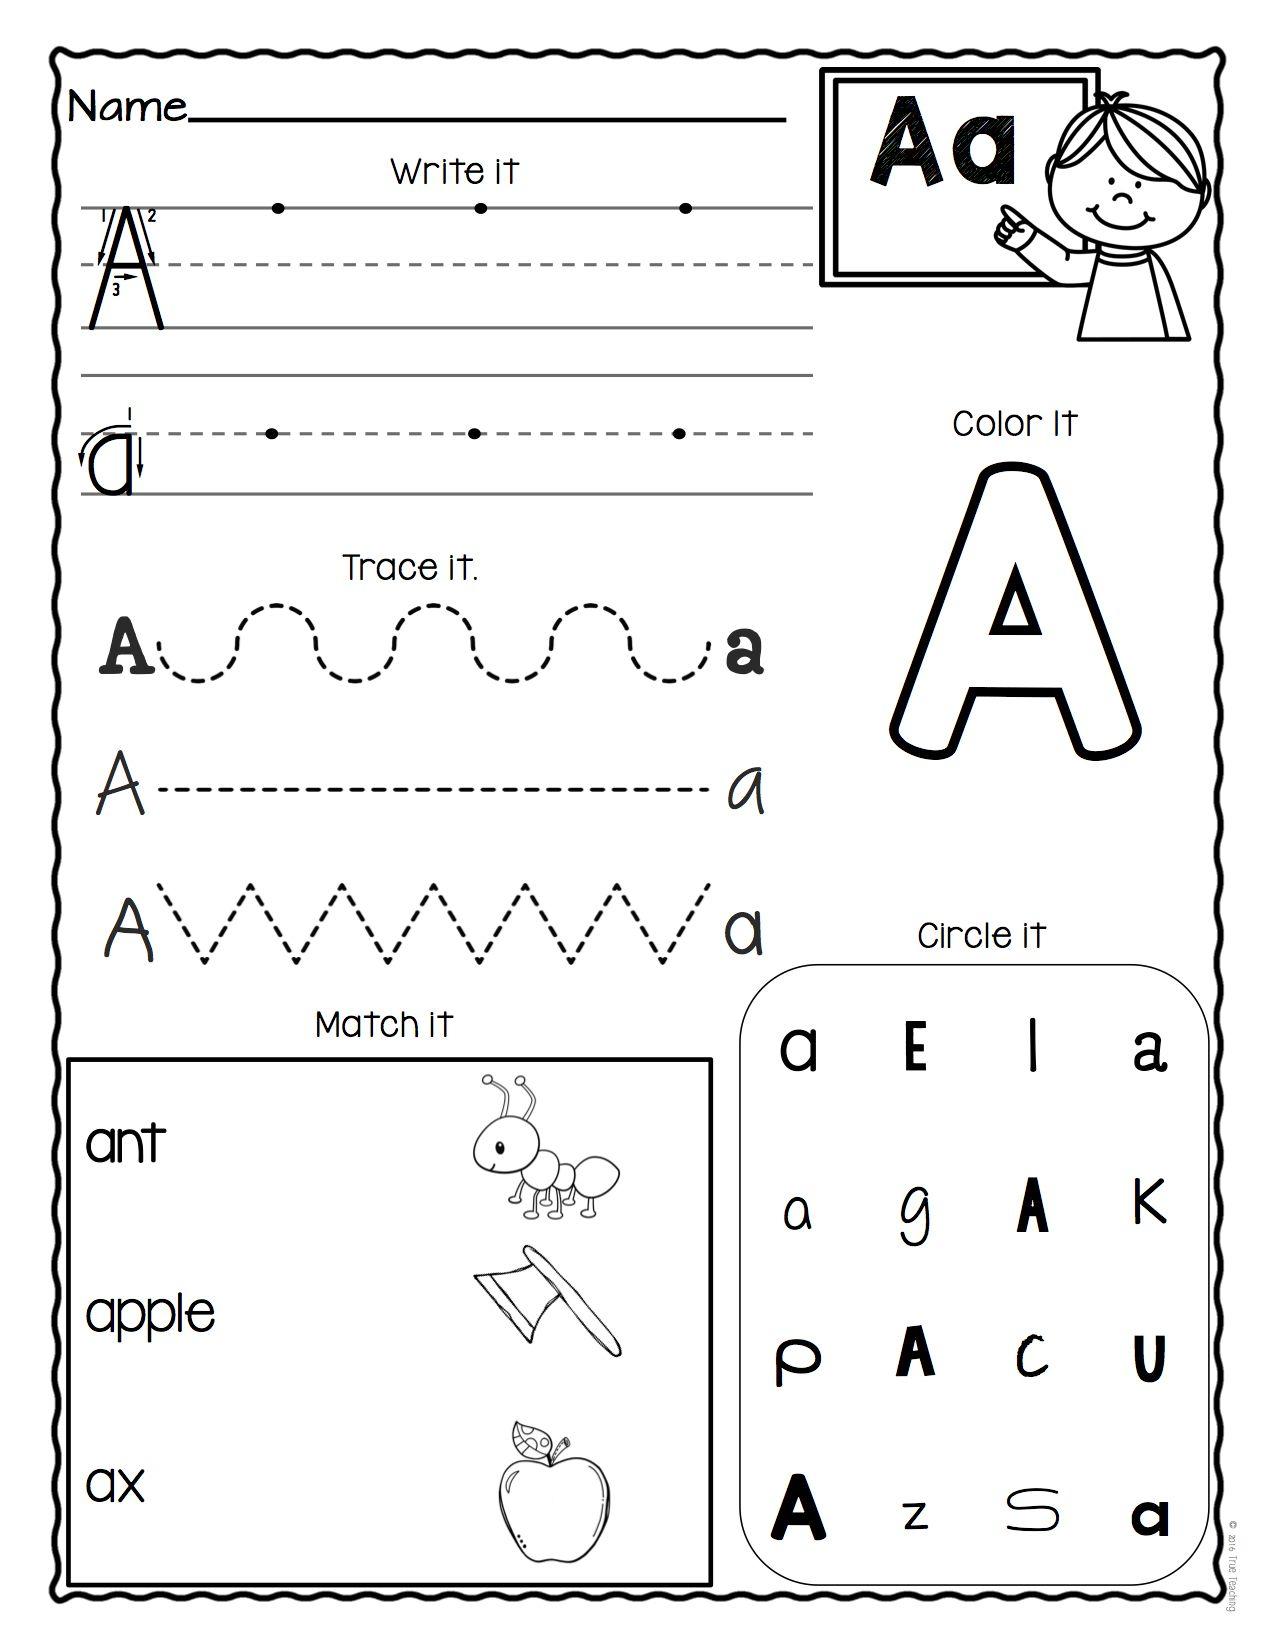 A-Z Letter Worksheetstrue Teaching   Alphabet Worksheets regarding Letter A Worksheets For Toddlers